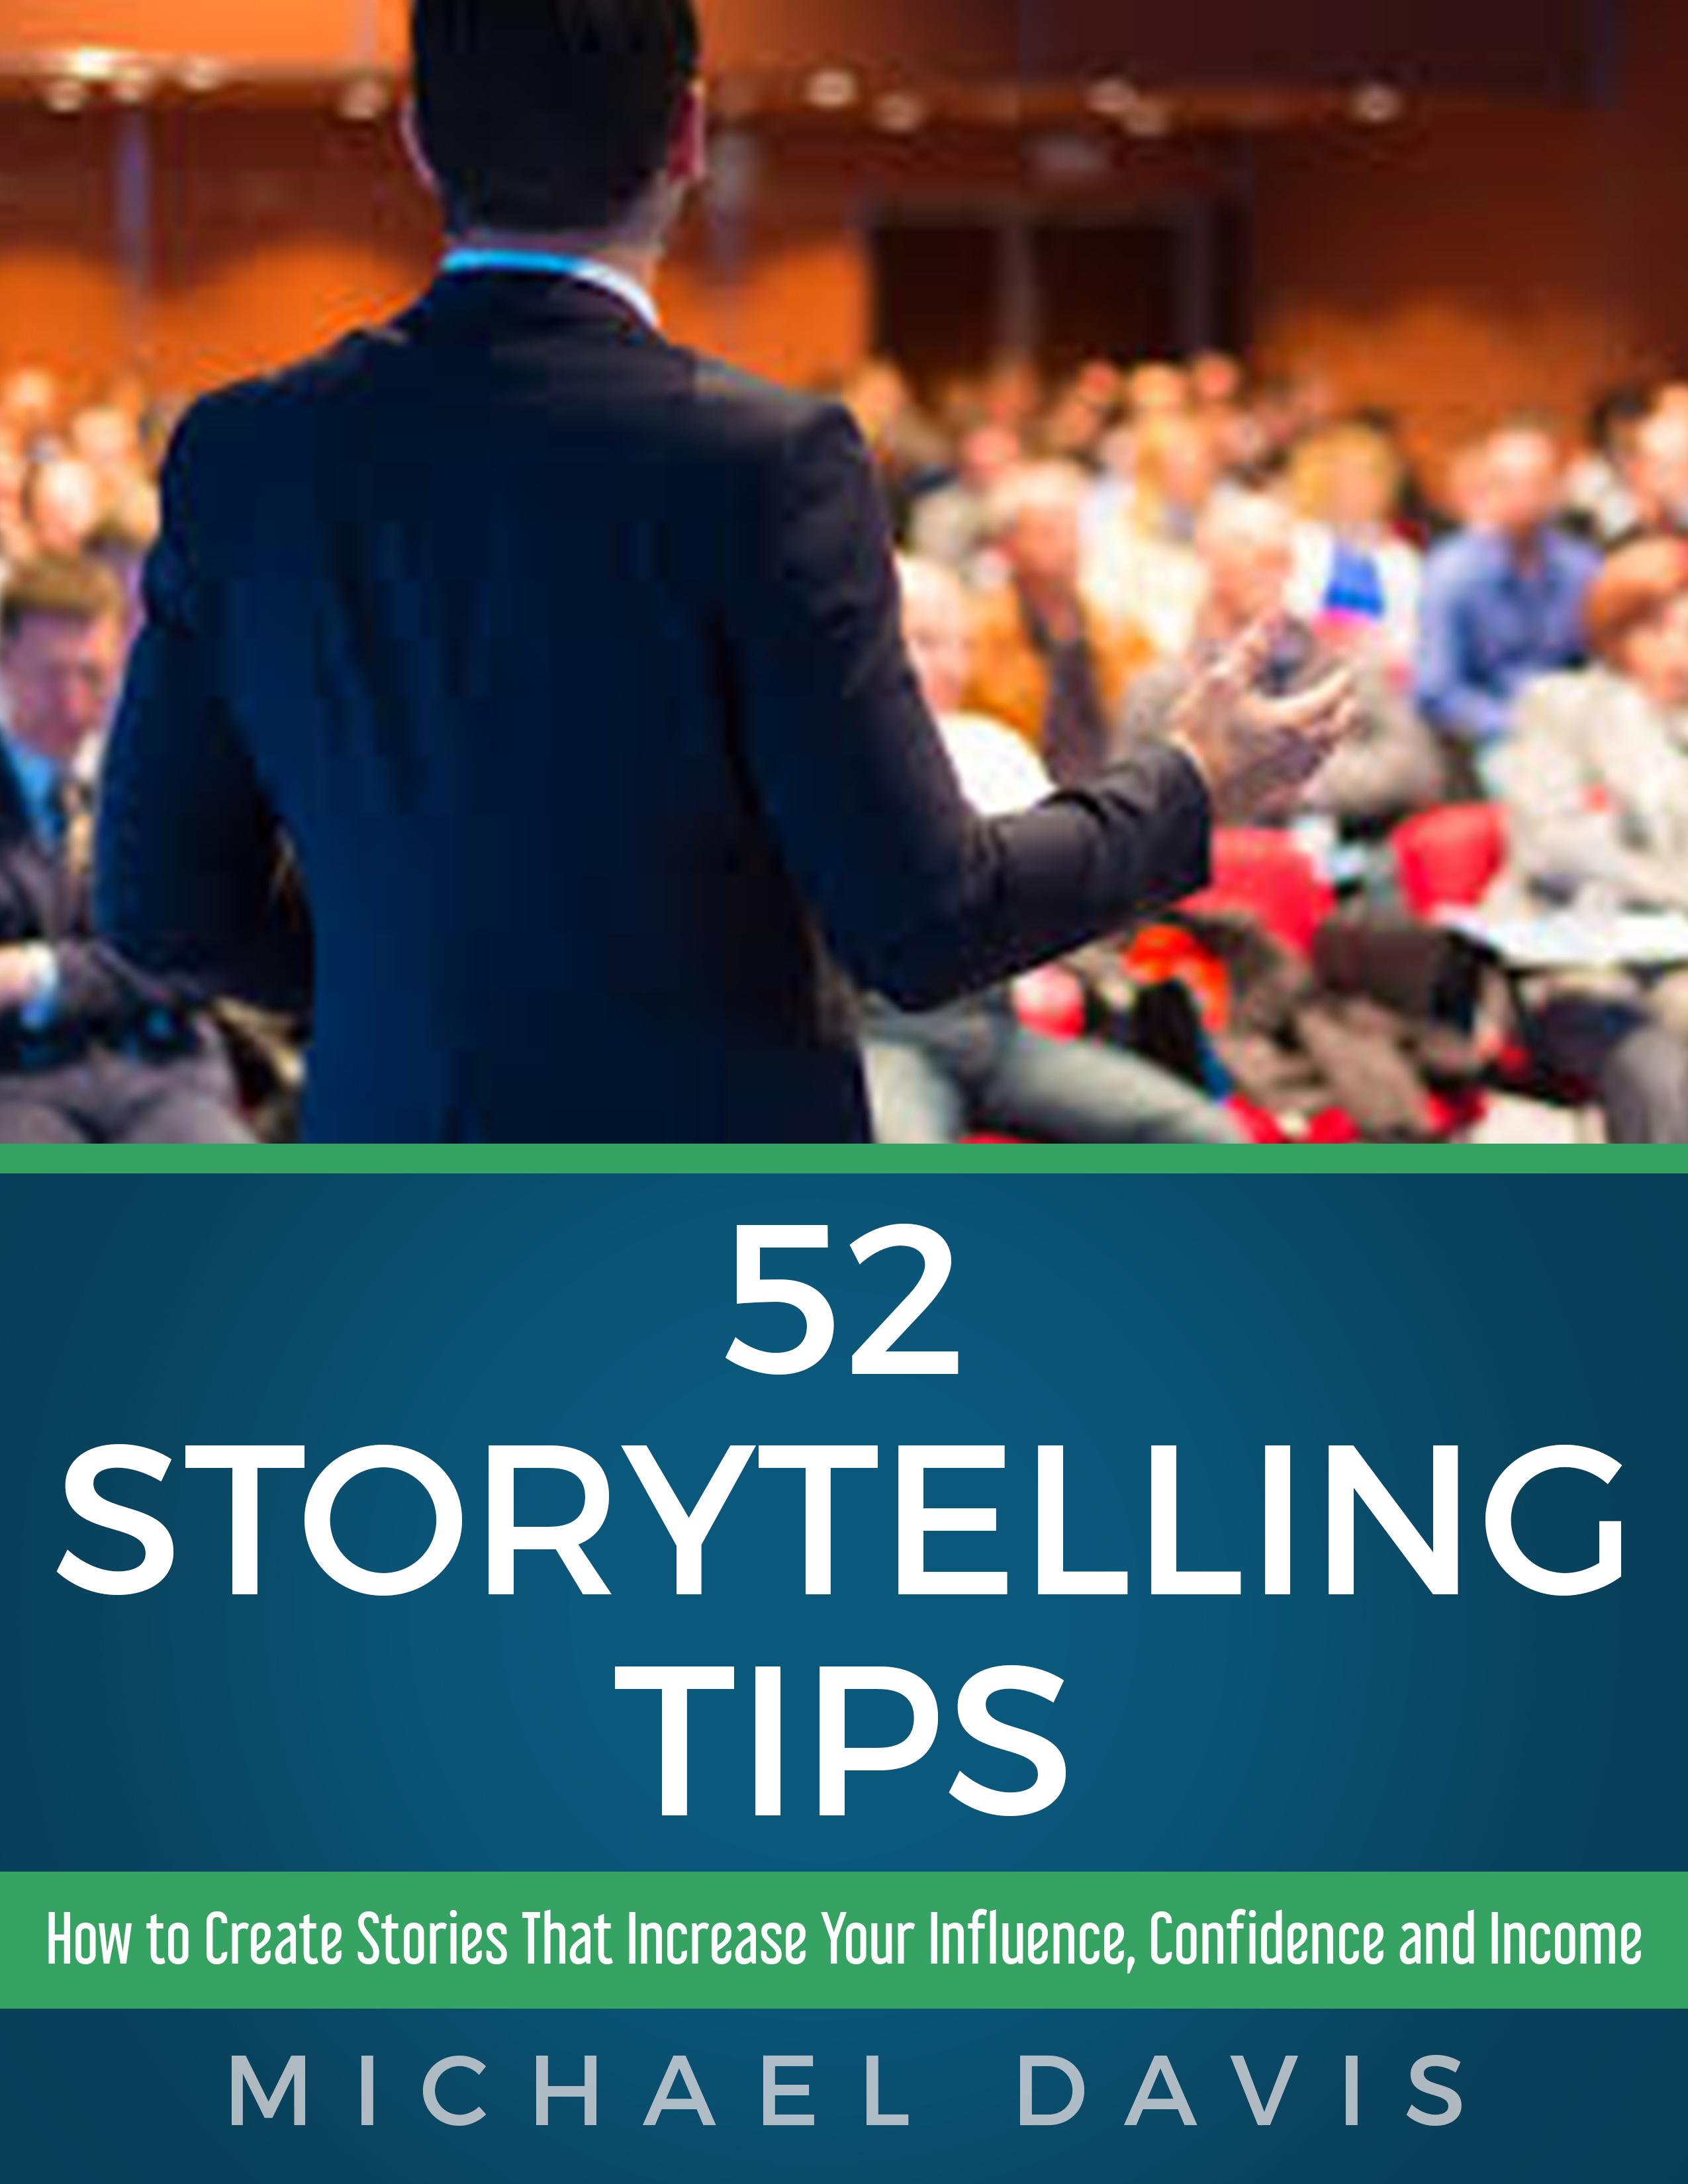 52 Storytelling Tips